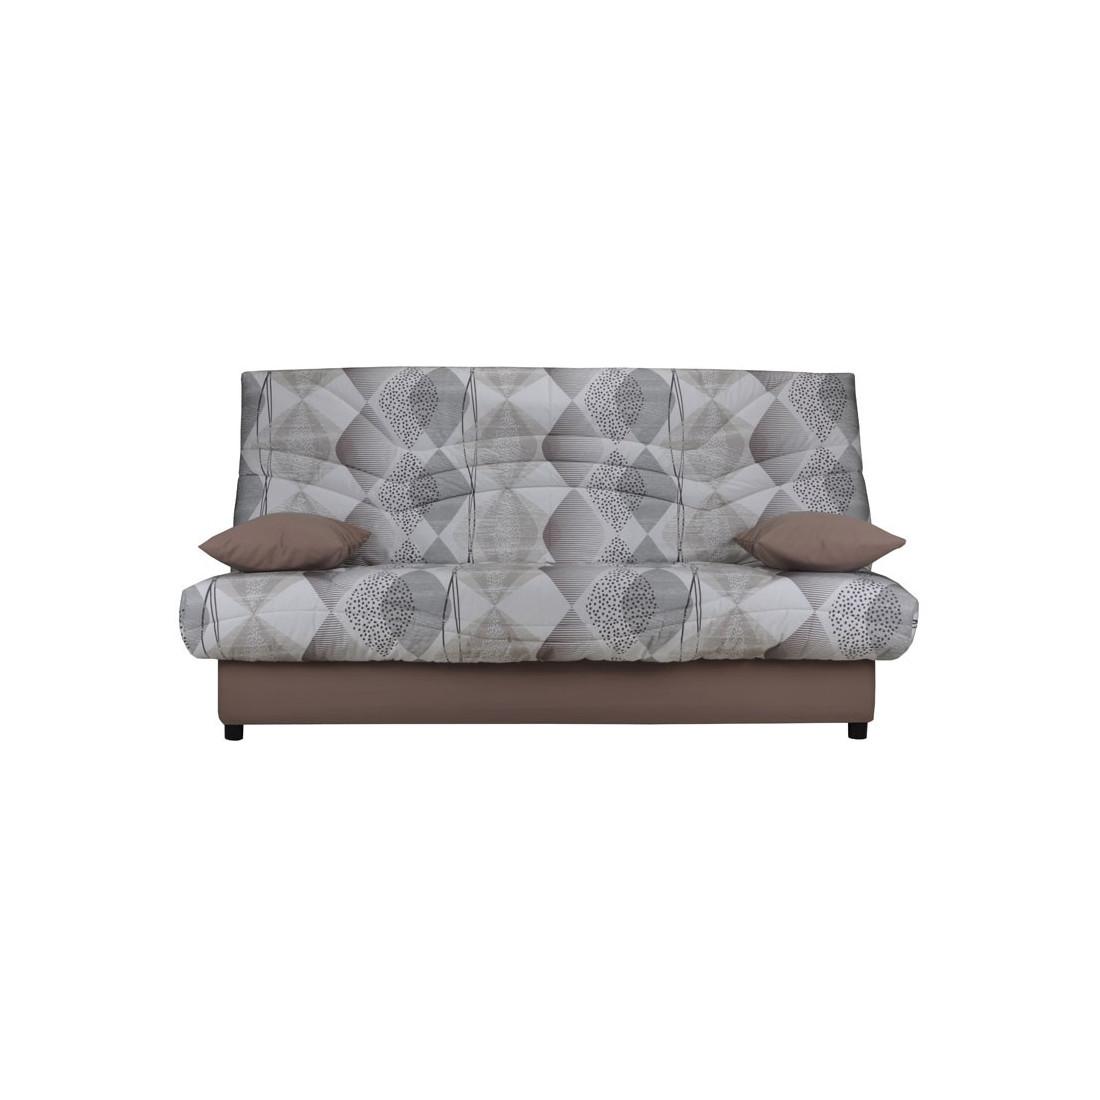 banquette lit clic clac motifs gris matelas hr 130 cm speed tsar n 14. Black Bedroom Furniture Sets. Home Design Ideas